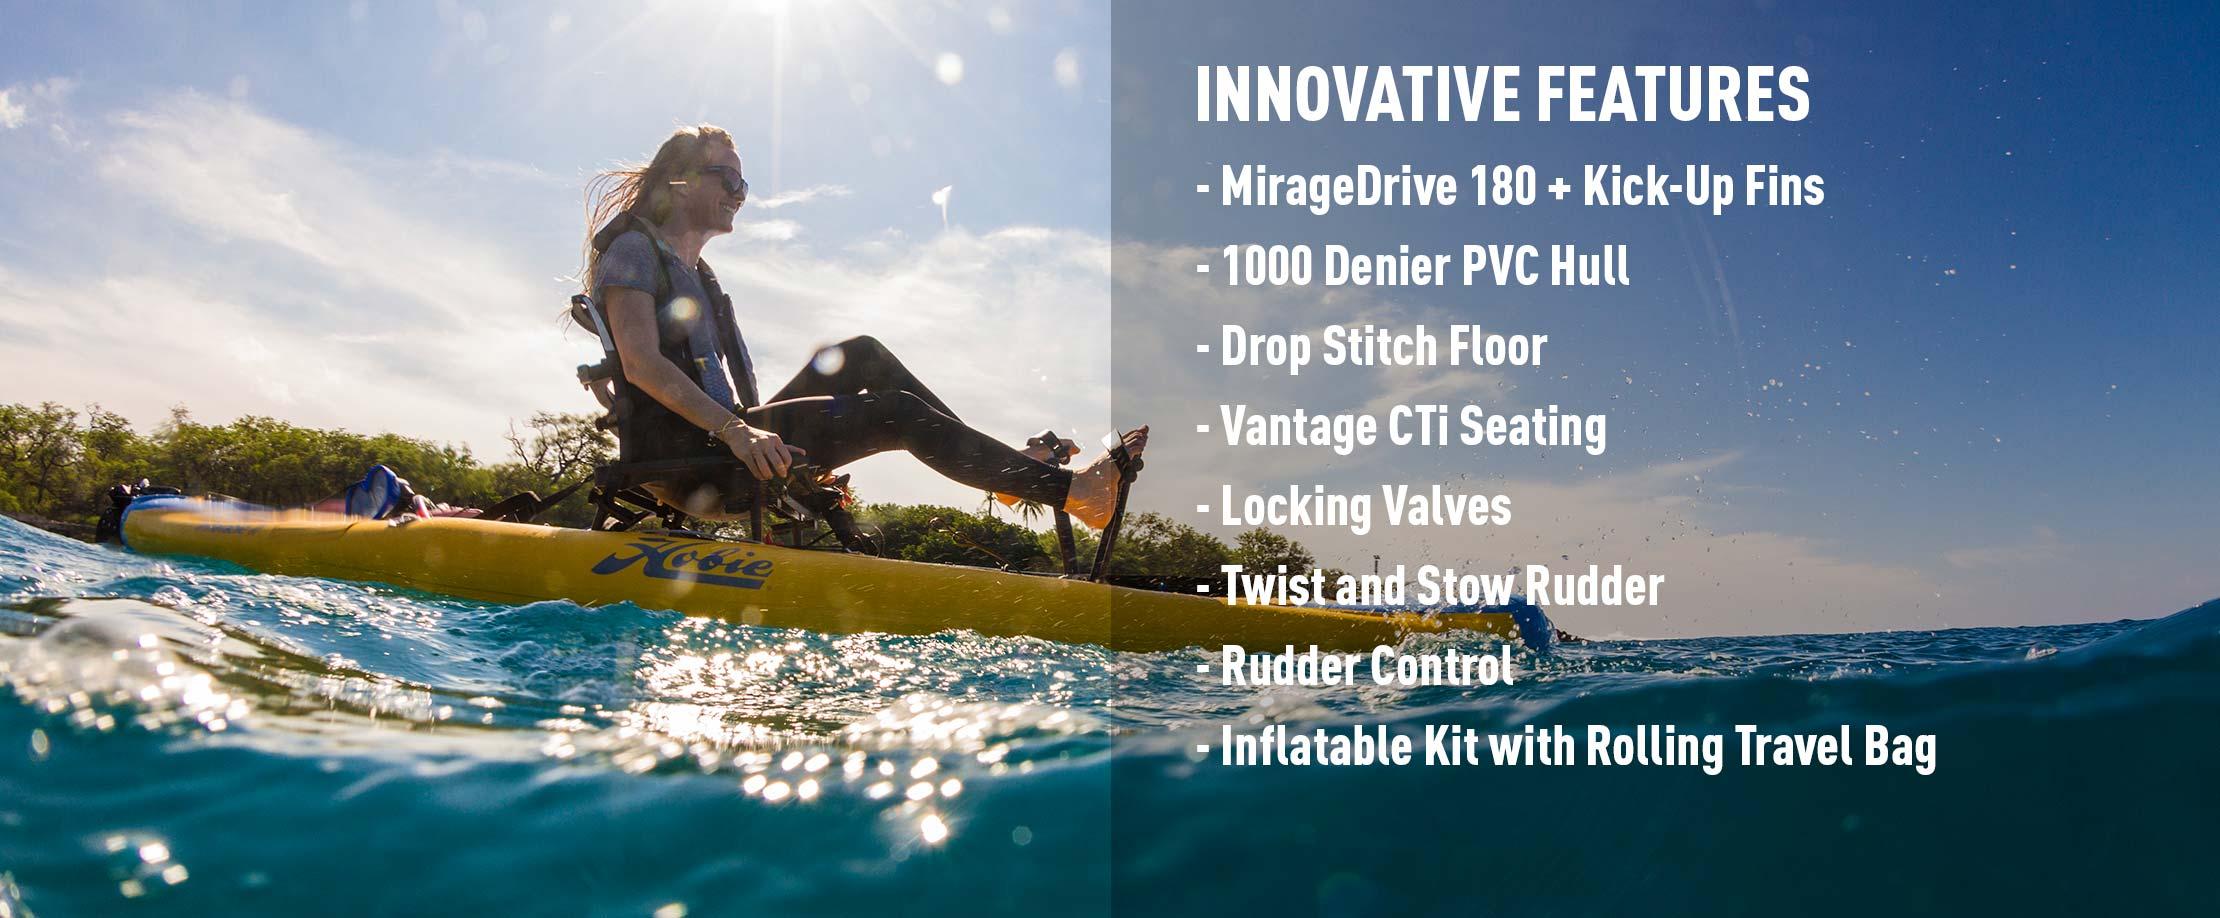 Mirage i11S Features